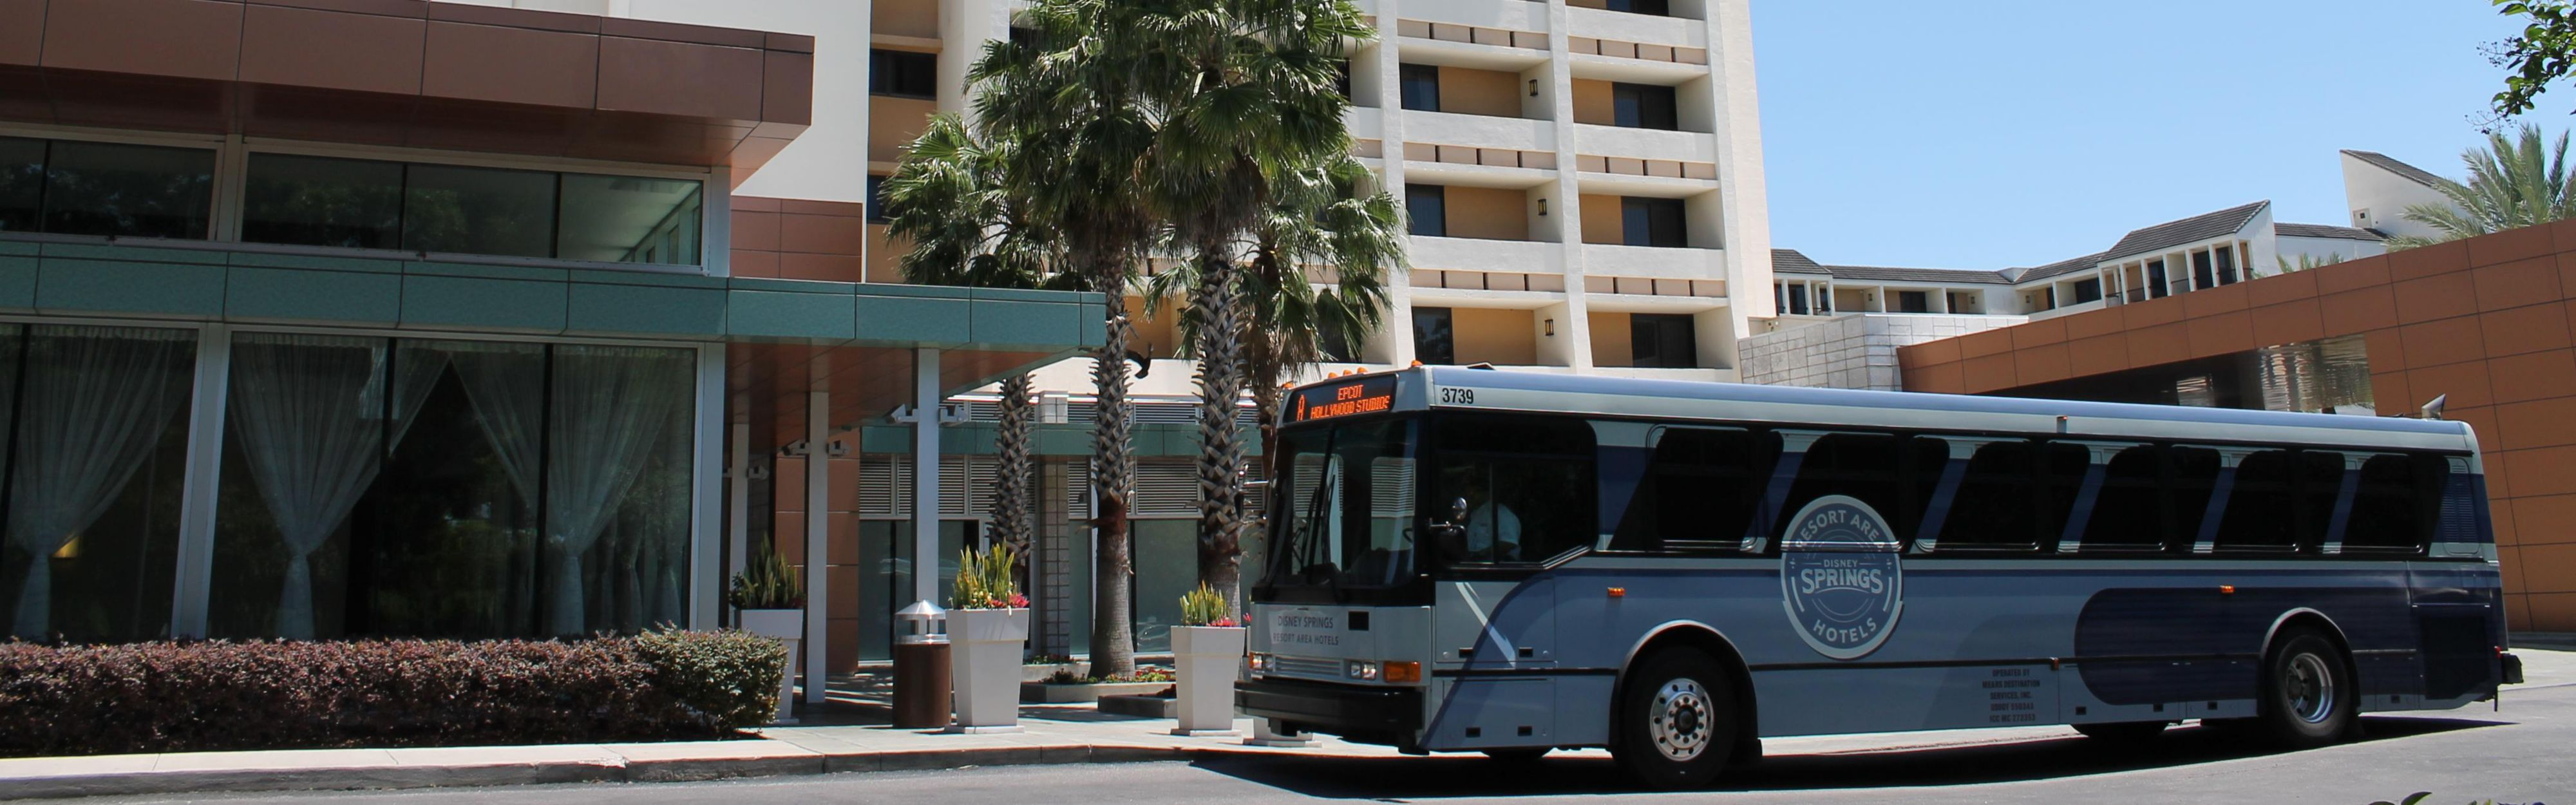 National Car Rental Disney World Orlando